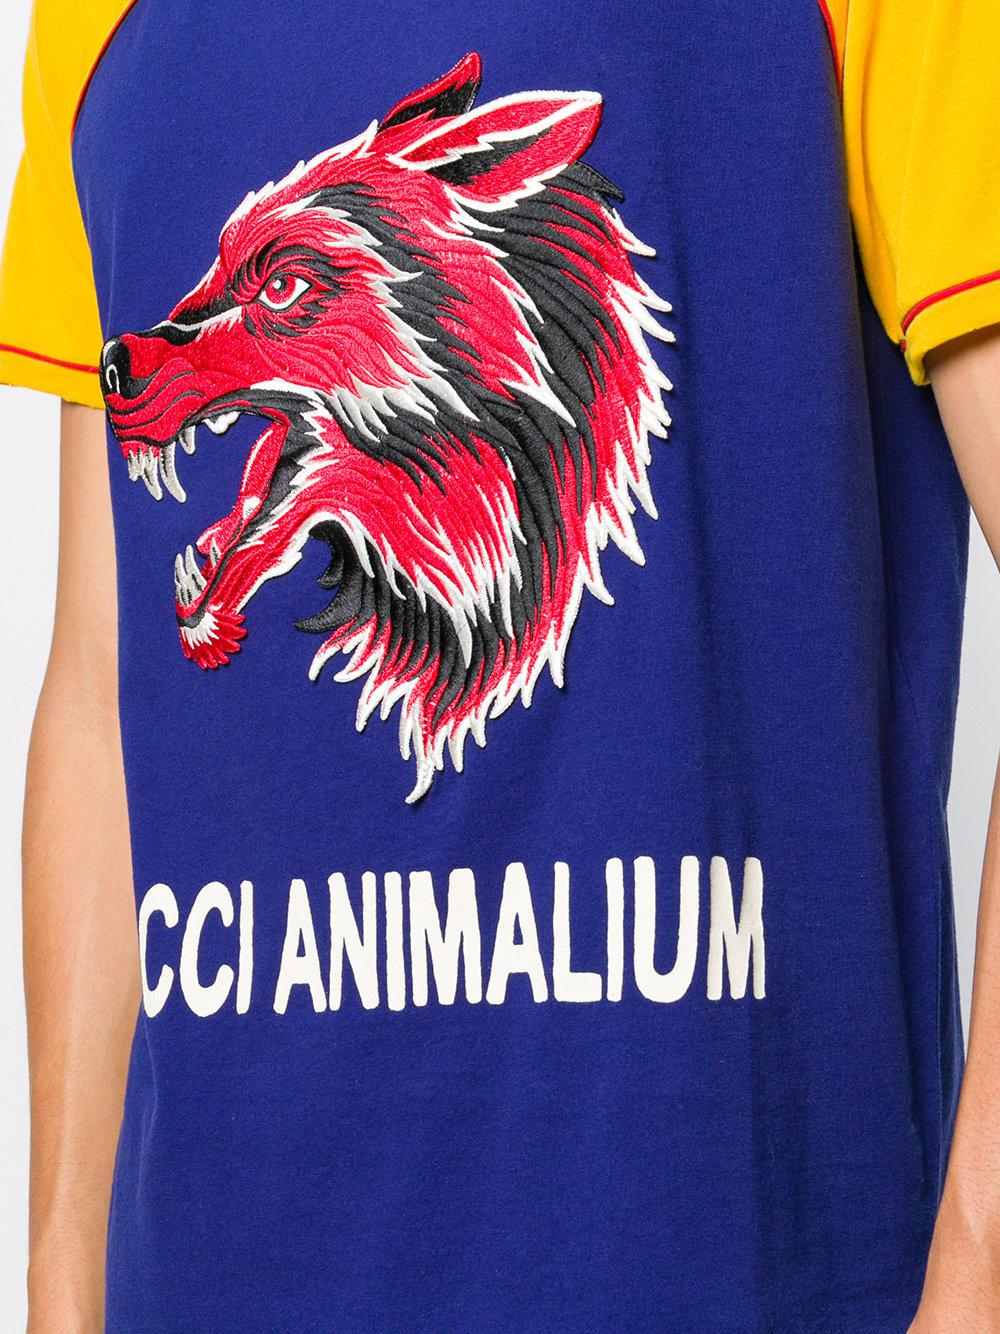 60c737badaa Lyst - Gucci Animalium T-shirt in Blue for Men